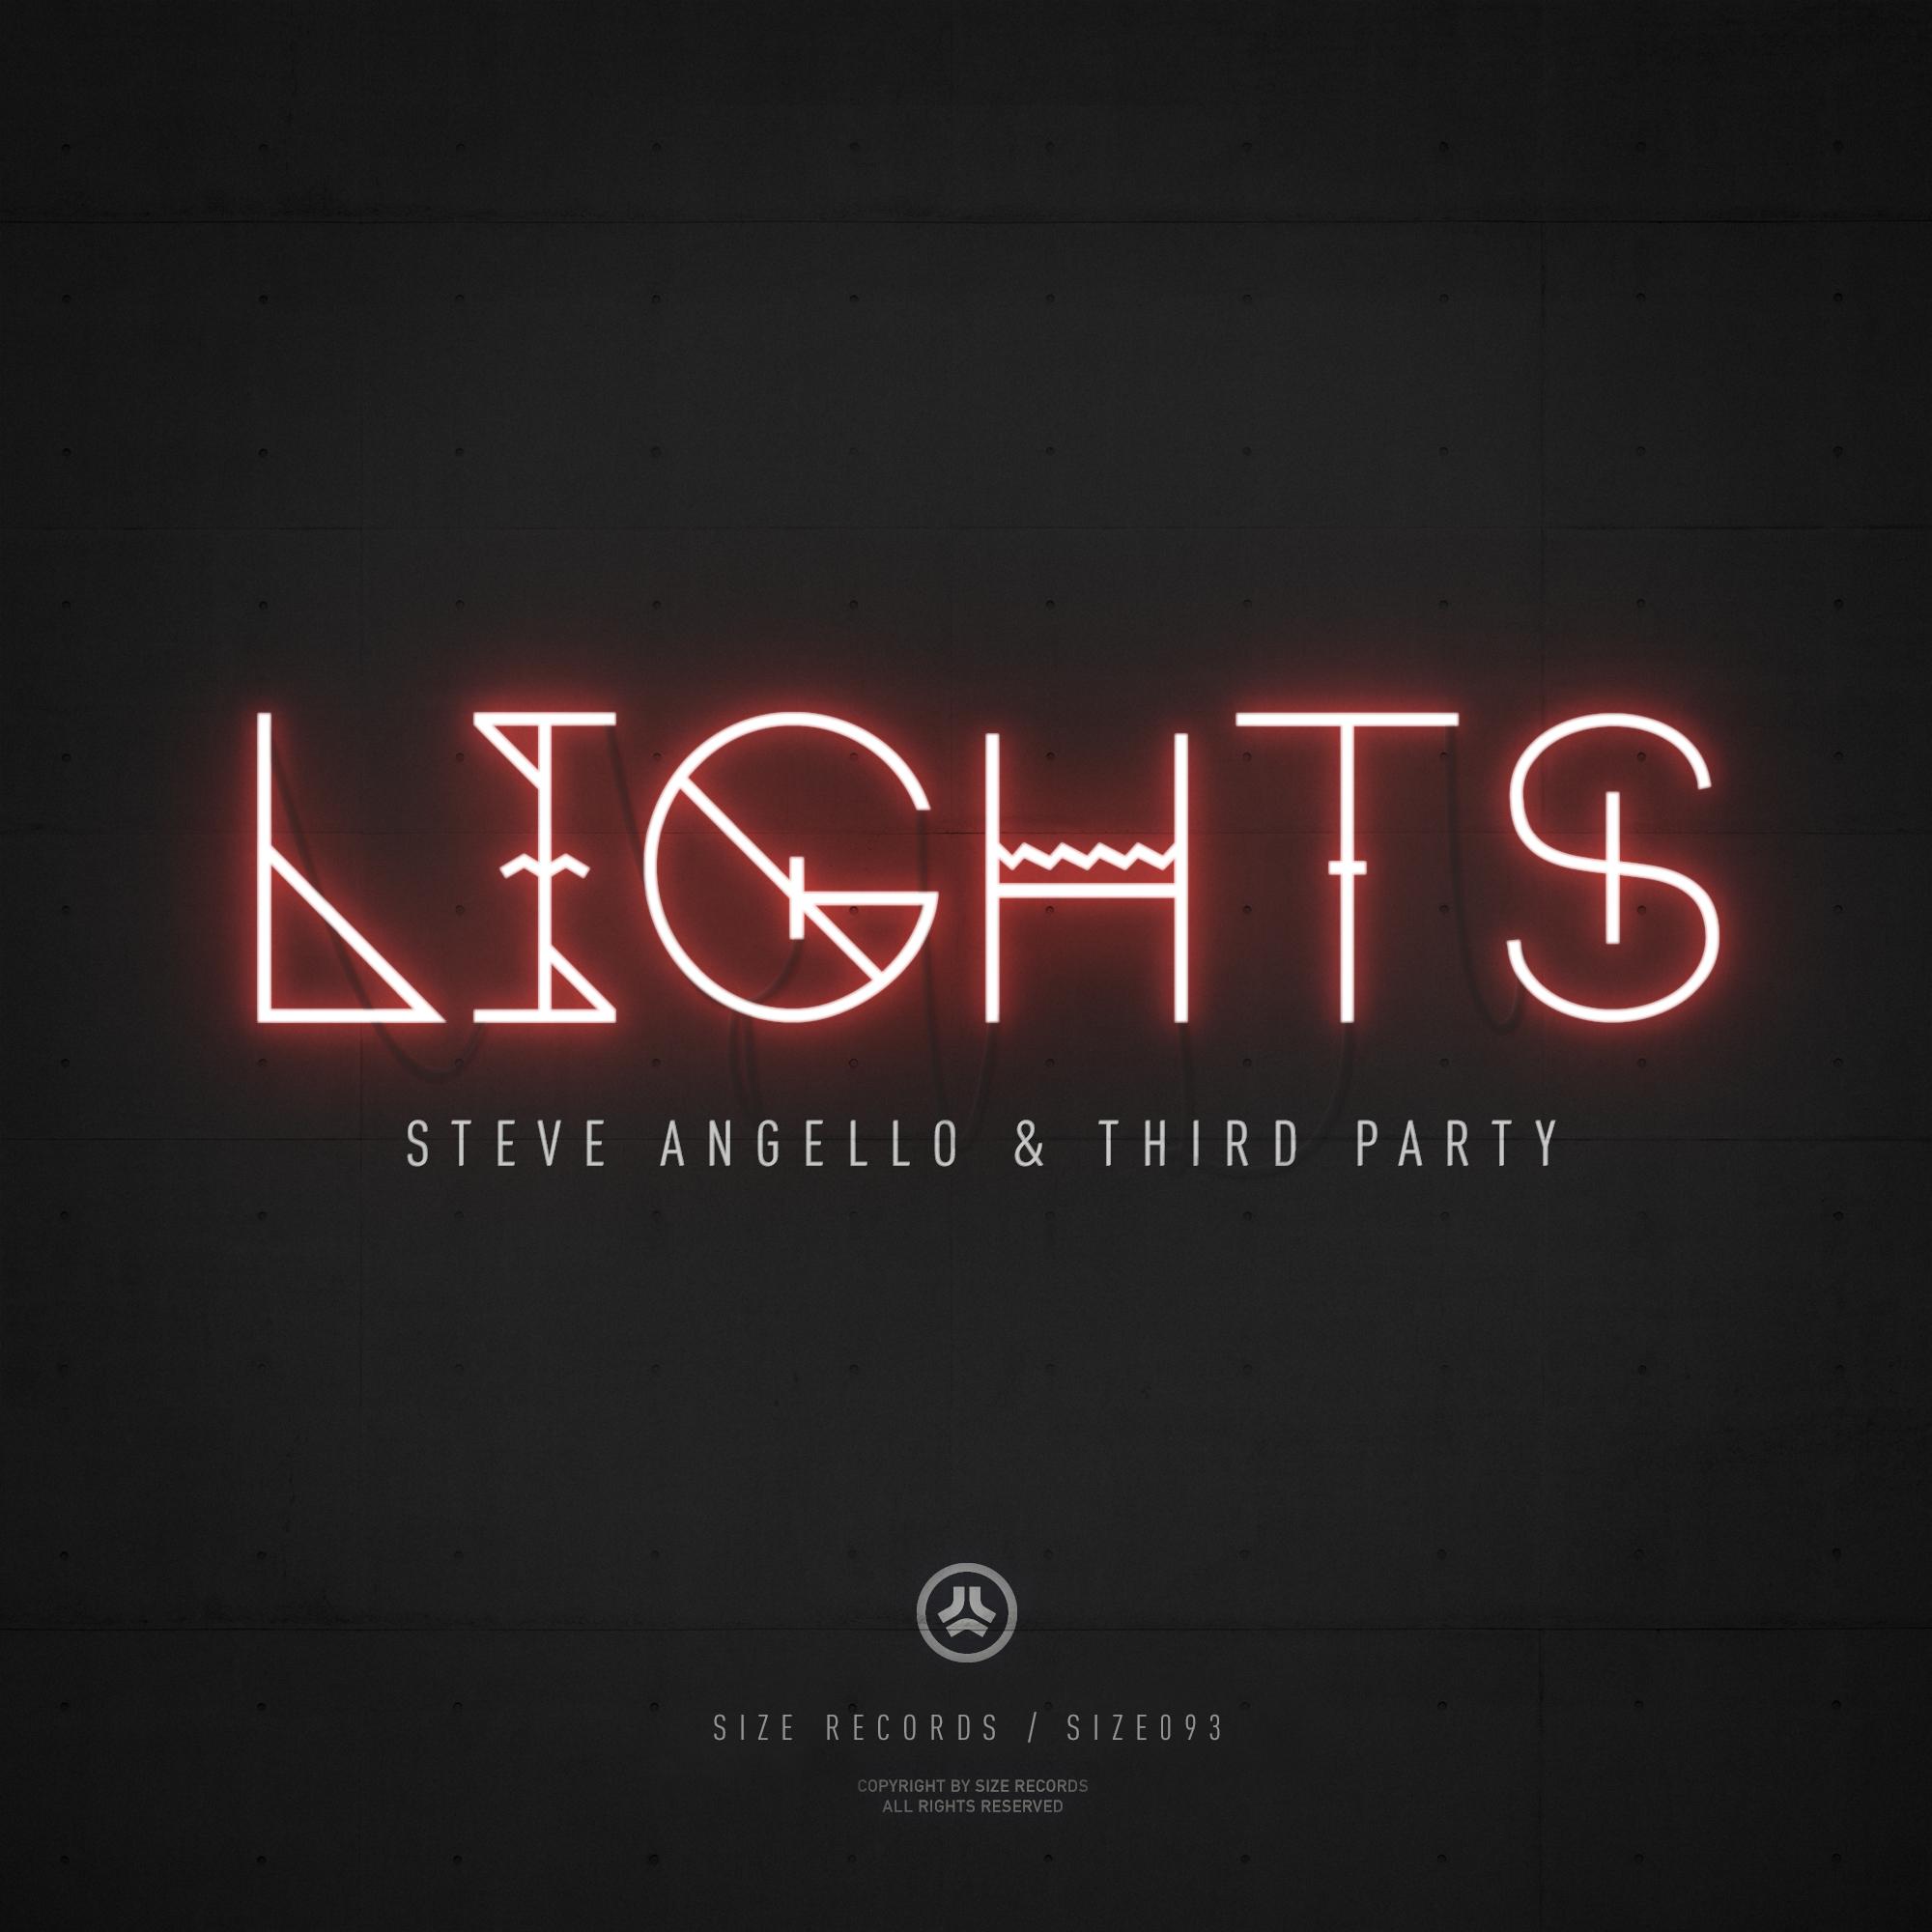 Lights - Steve Angello